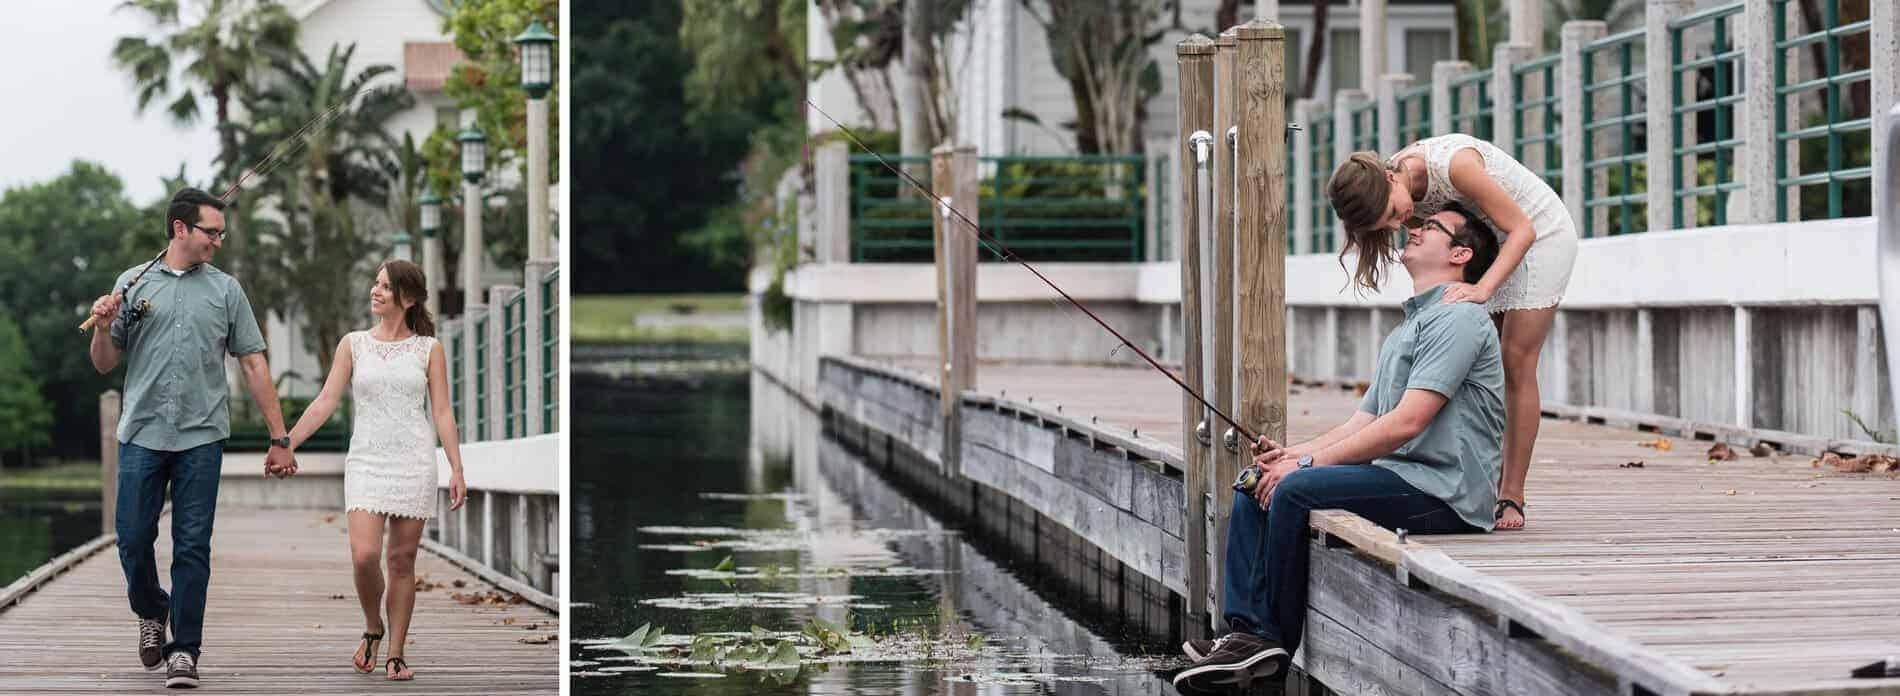 Engaged couple fishing in front of the Bohemian Celebration Hotel at Celebration, Florida